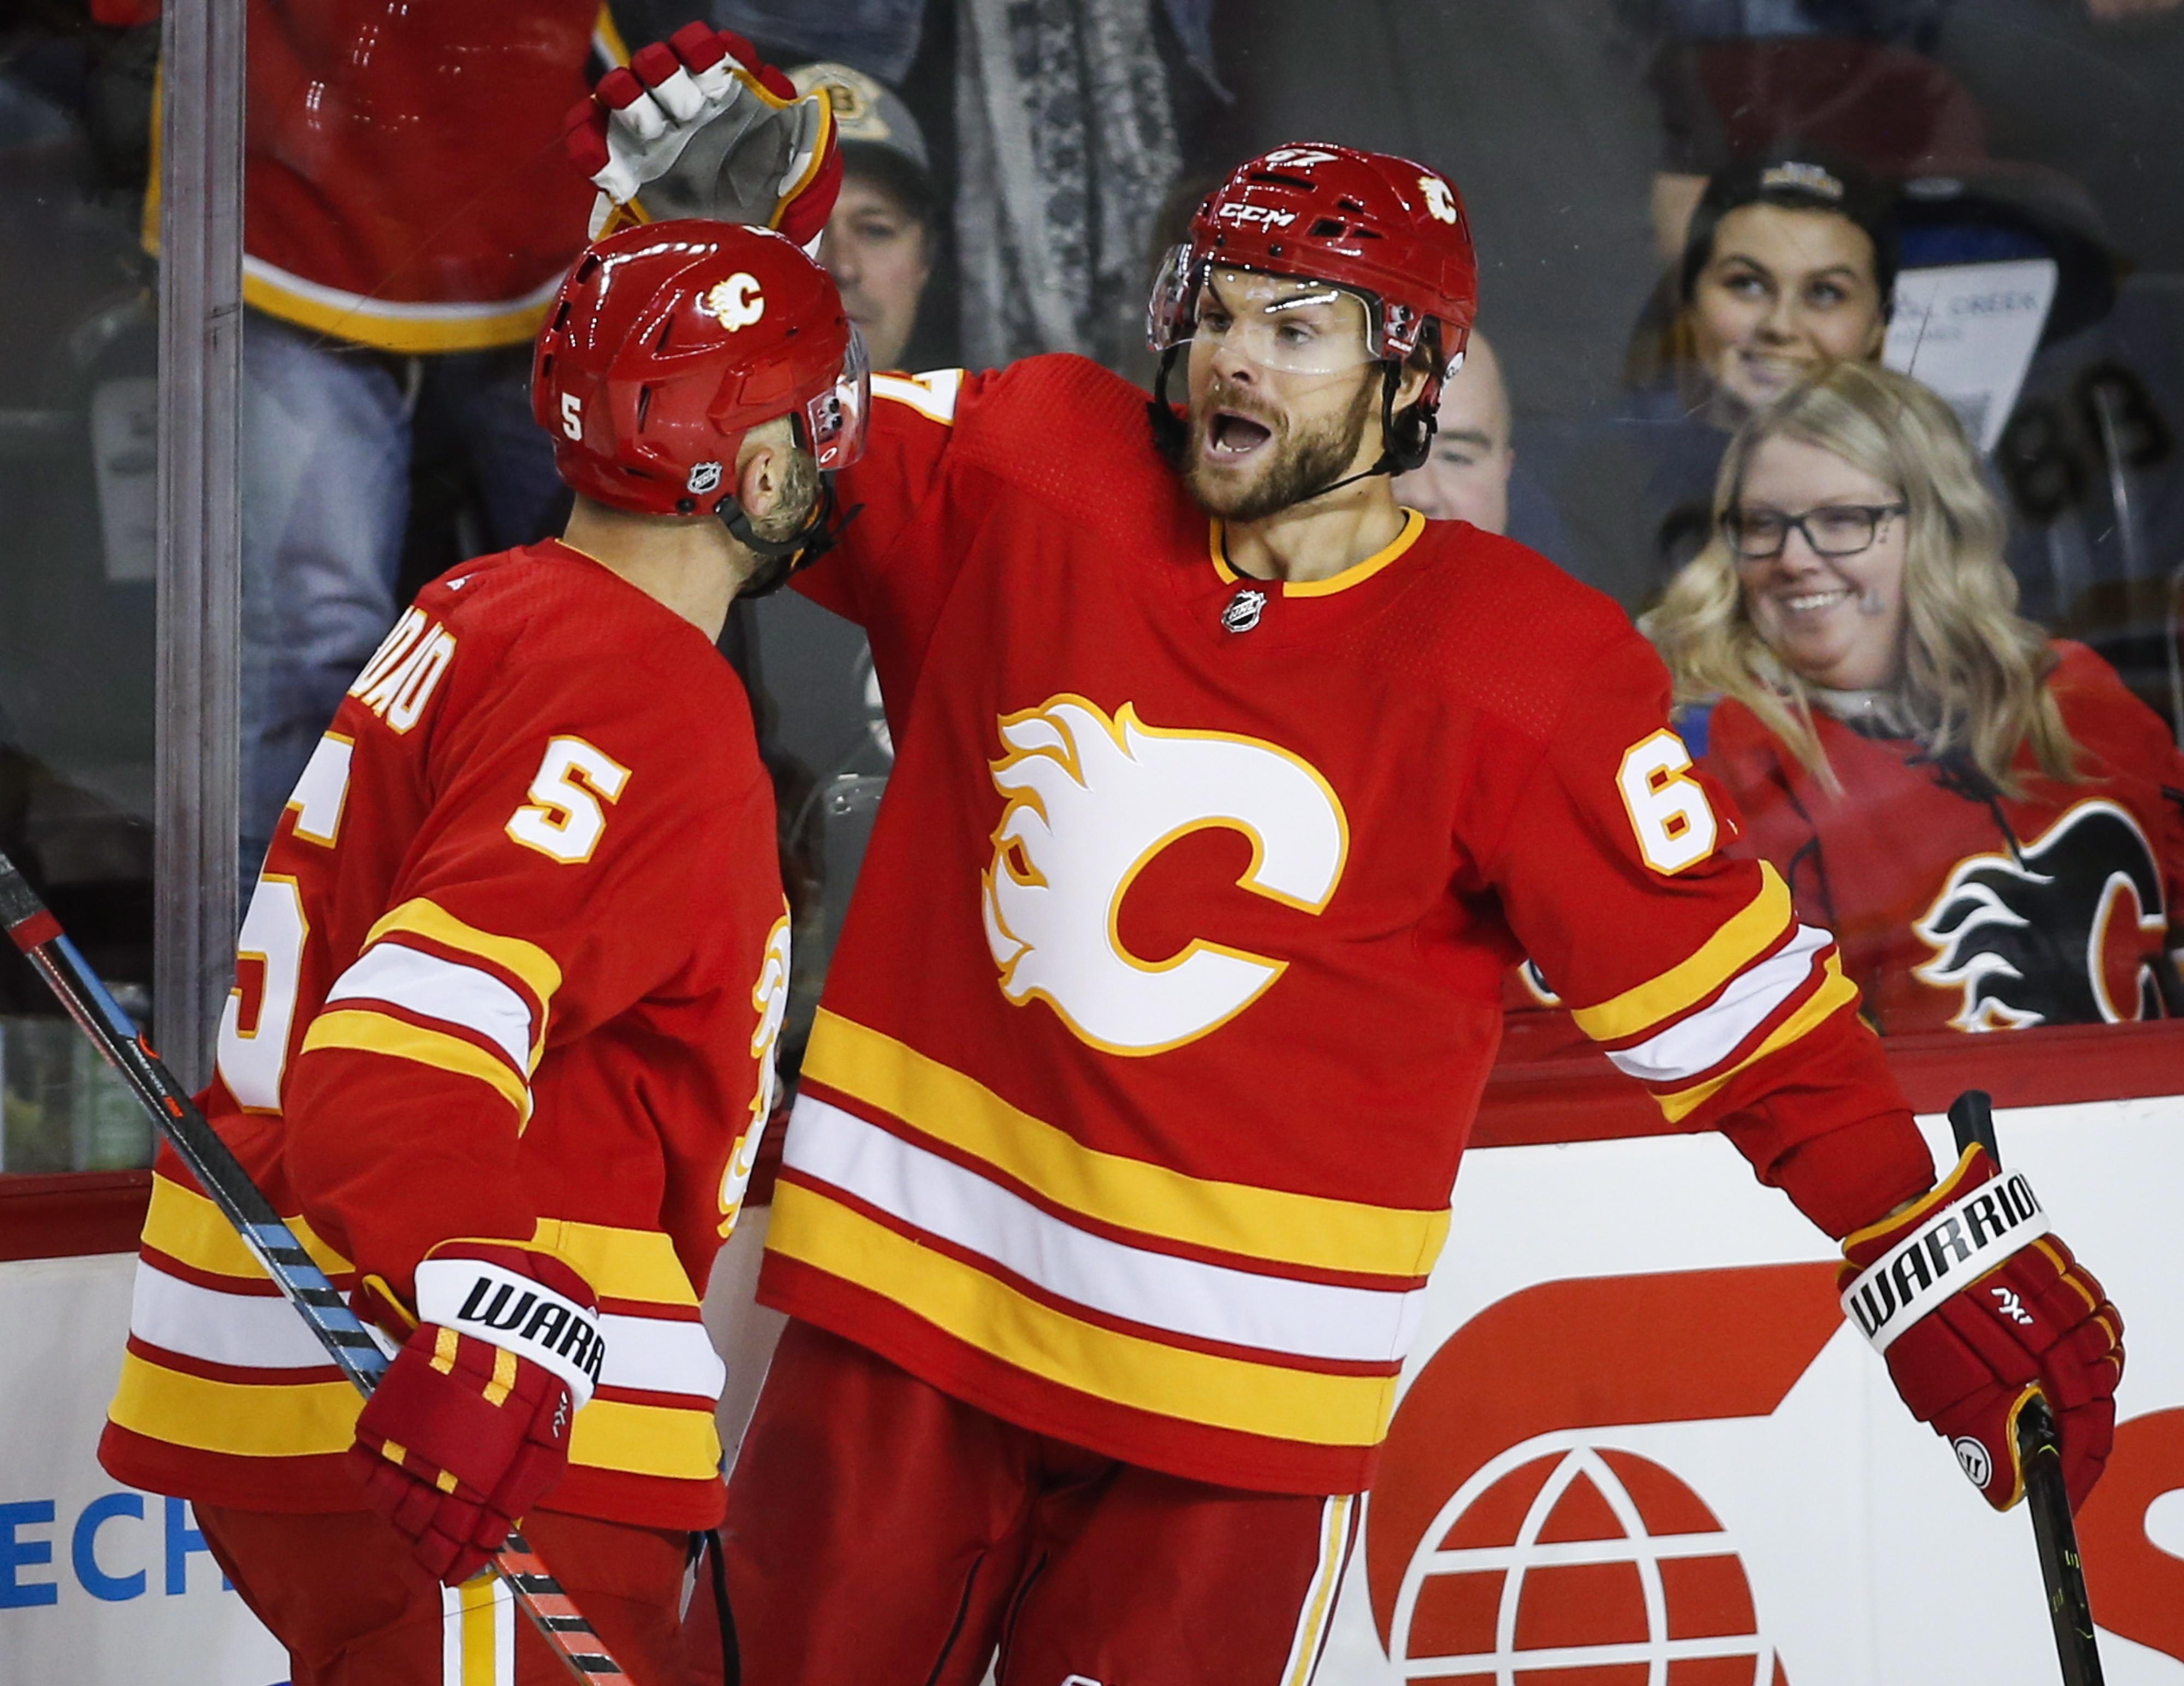 Frolik scores twice, leads Flames past Bruins 5-2